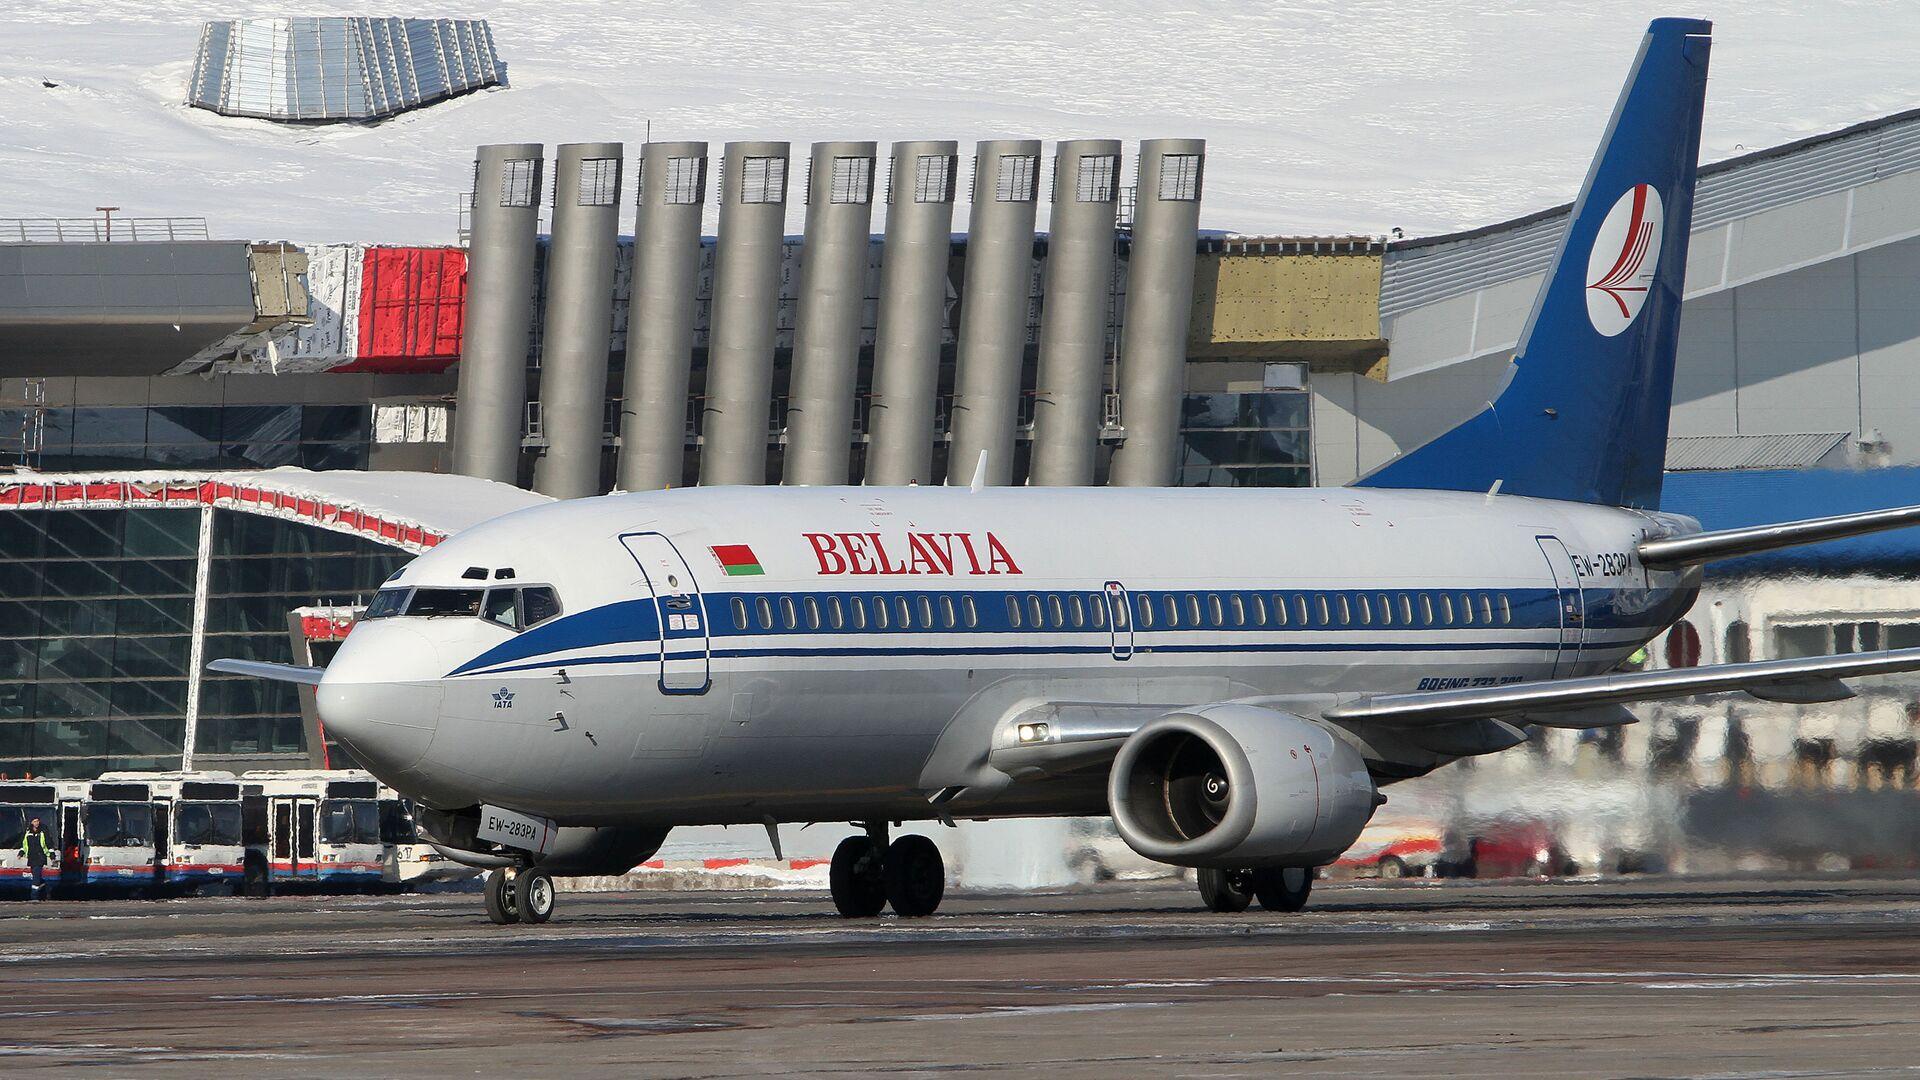 Un avión de la aerolínea Belavia - Sputnik Mundo, 1920, 25.05.2021